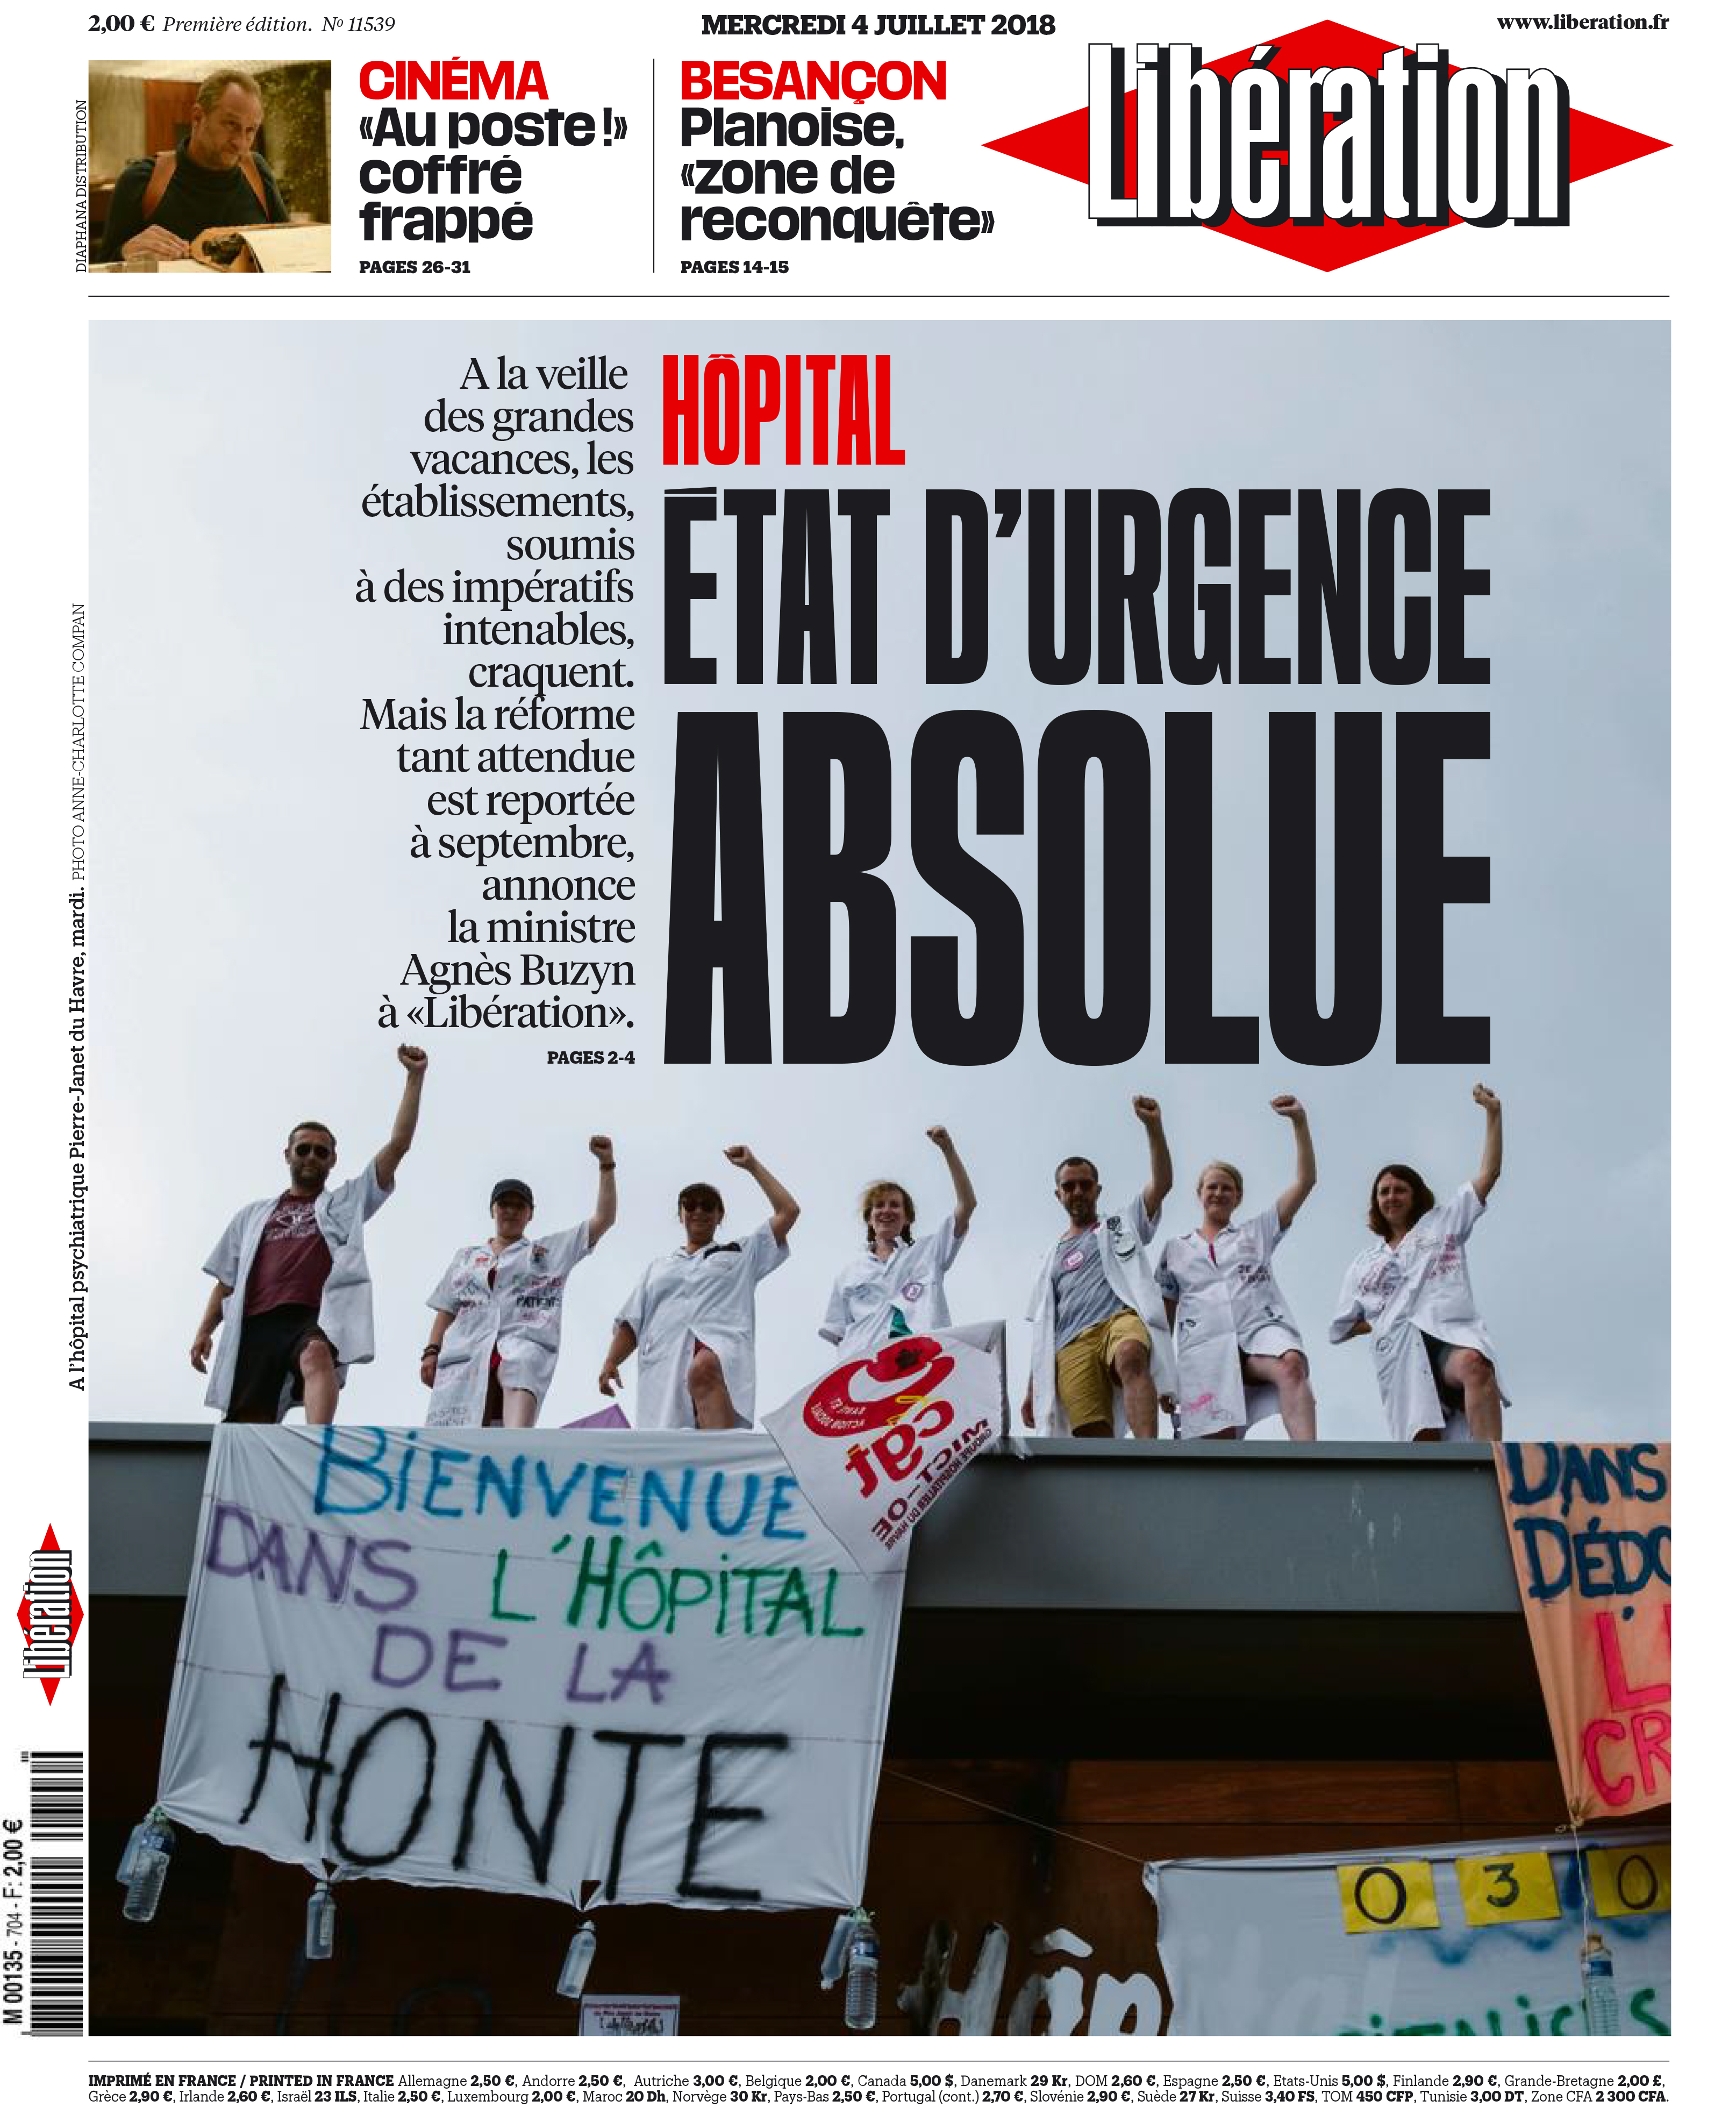 Libération 4 juillet 2018